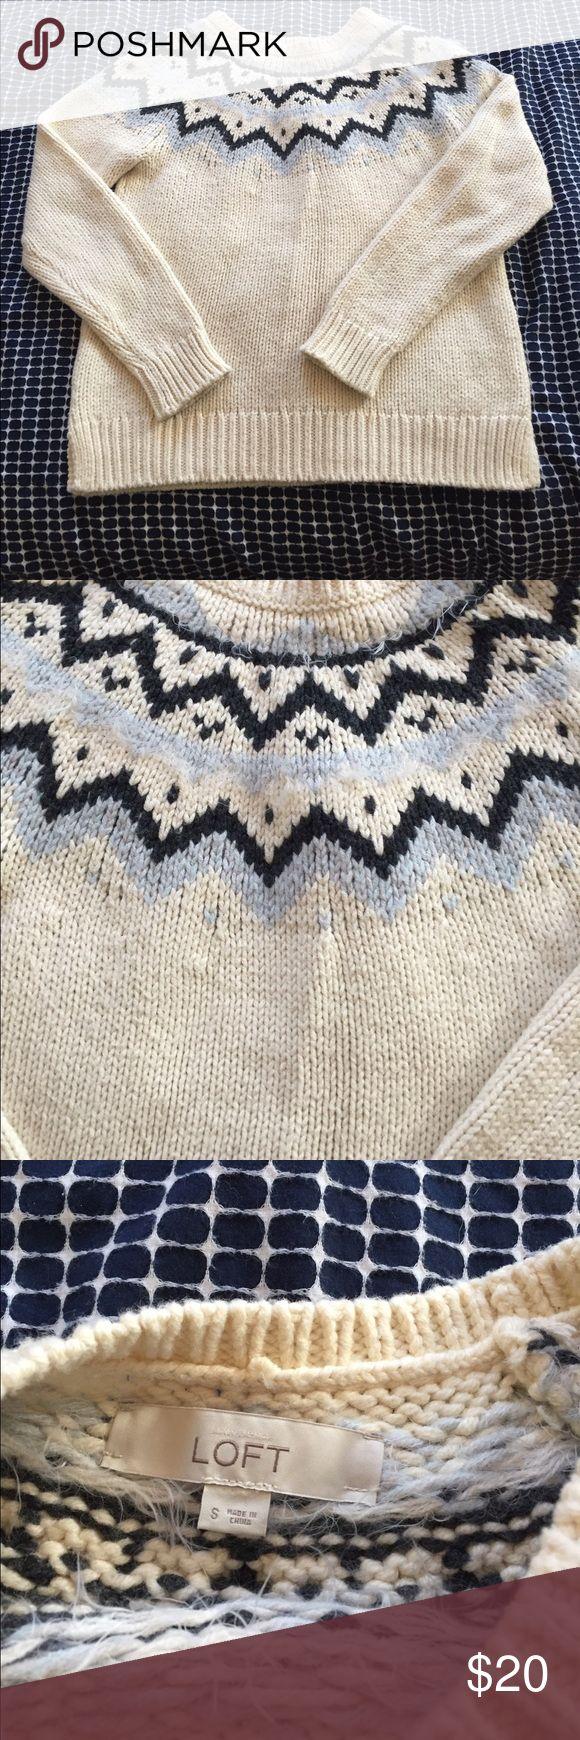 Loft Fairisle Sweater size small Loft Fairisle sweater small. Chunky knit with No marks and only worn twice. LOFT Sweaters Crew & Scoop Necks